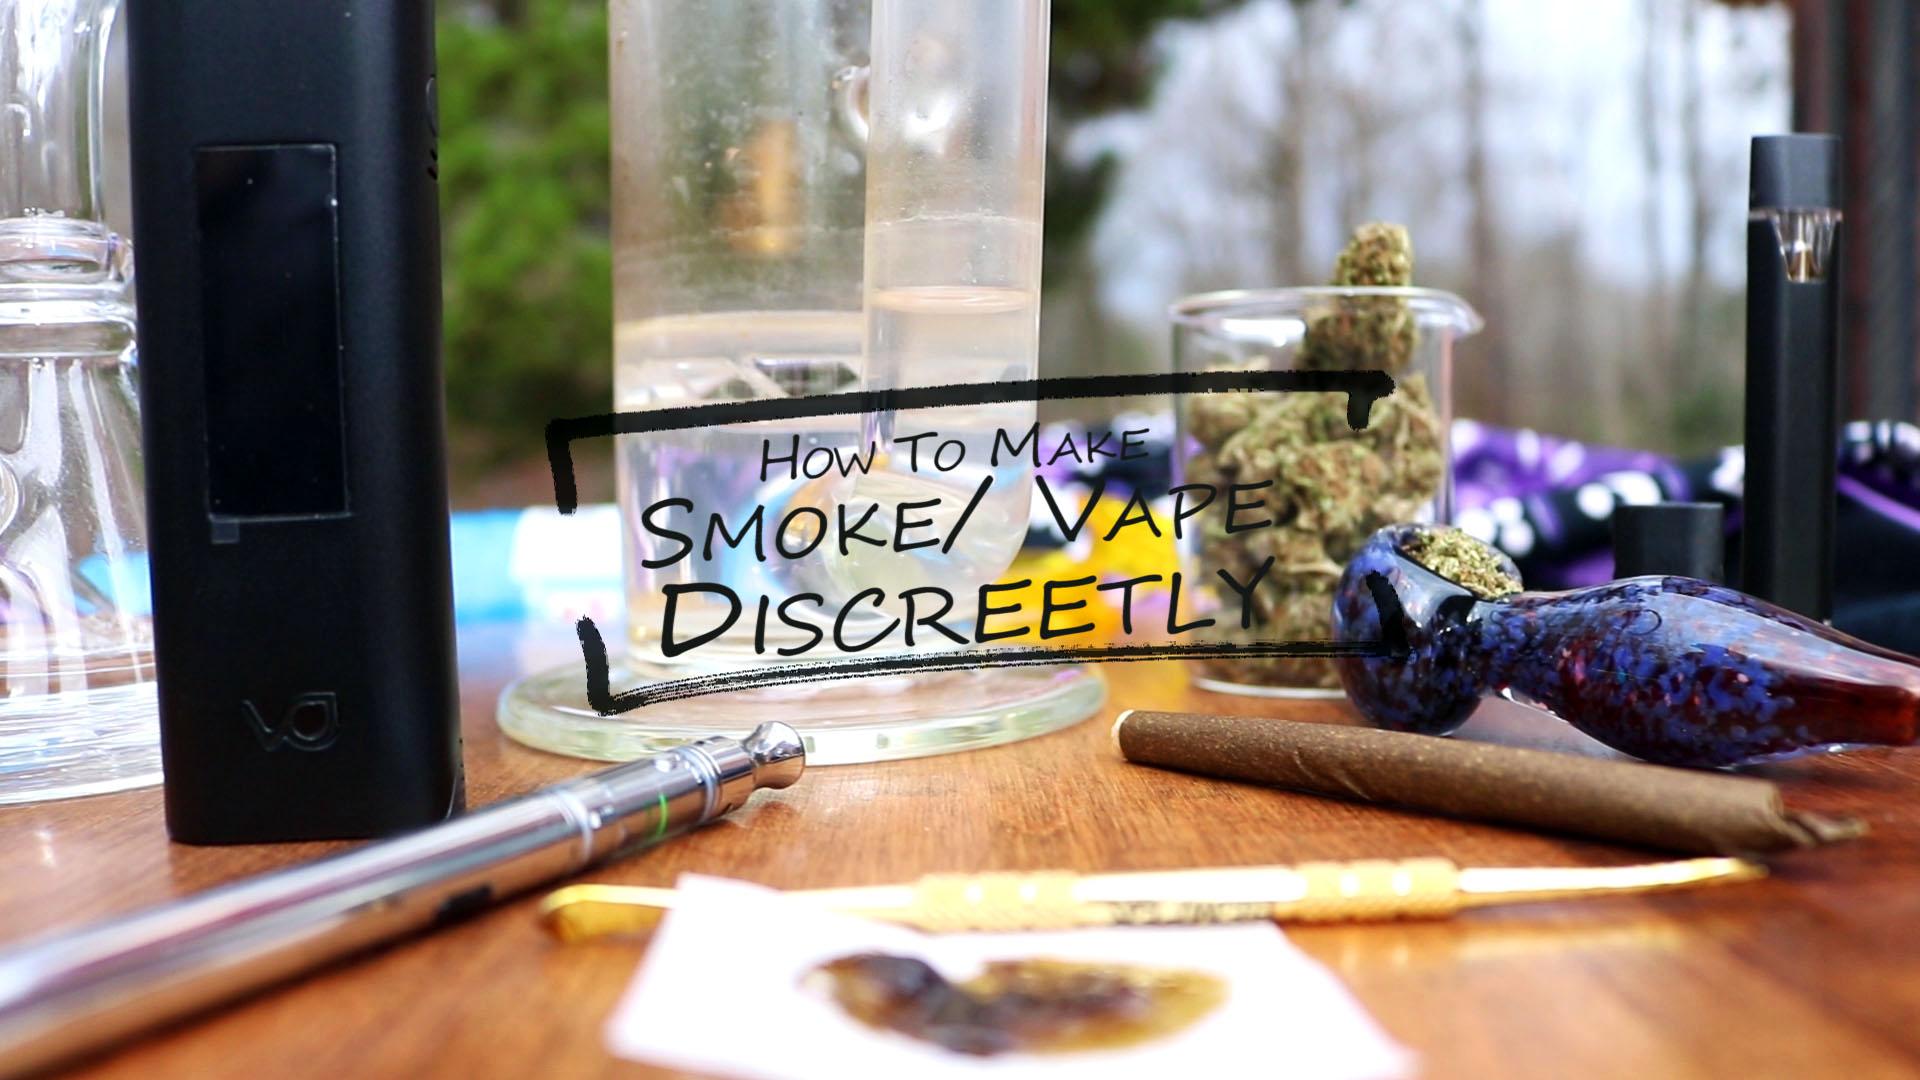 How to Smoke Vape Cannabis Discreetly.00_00_08_21.Still001